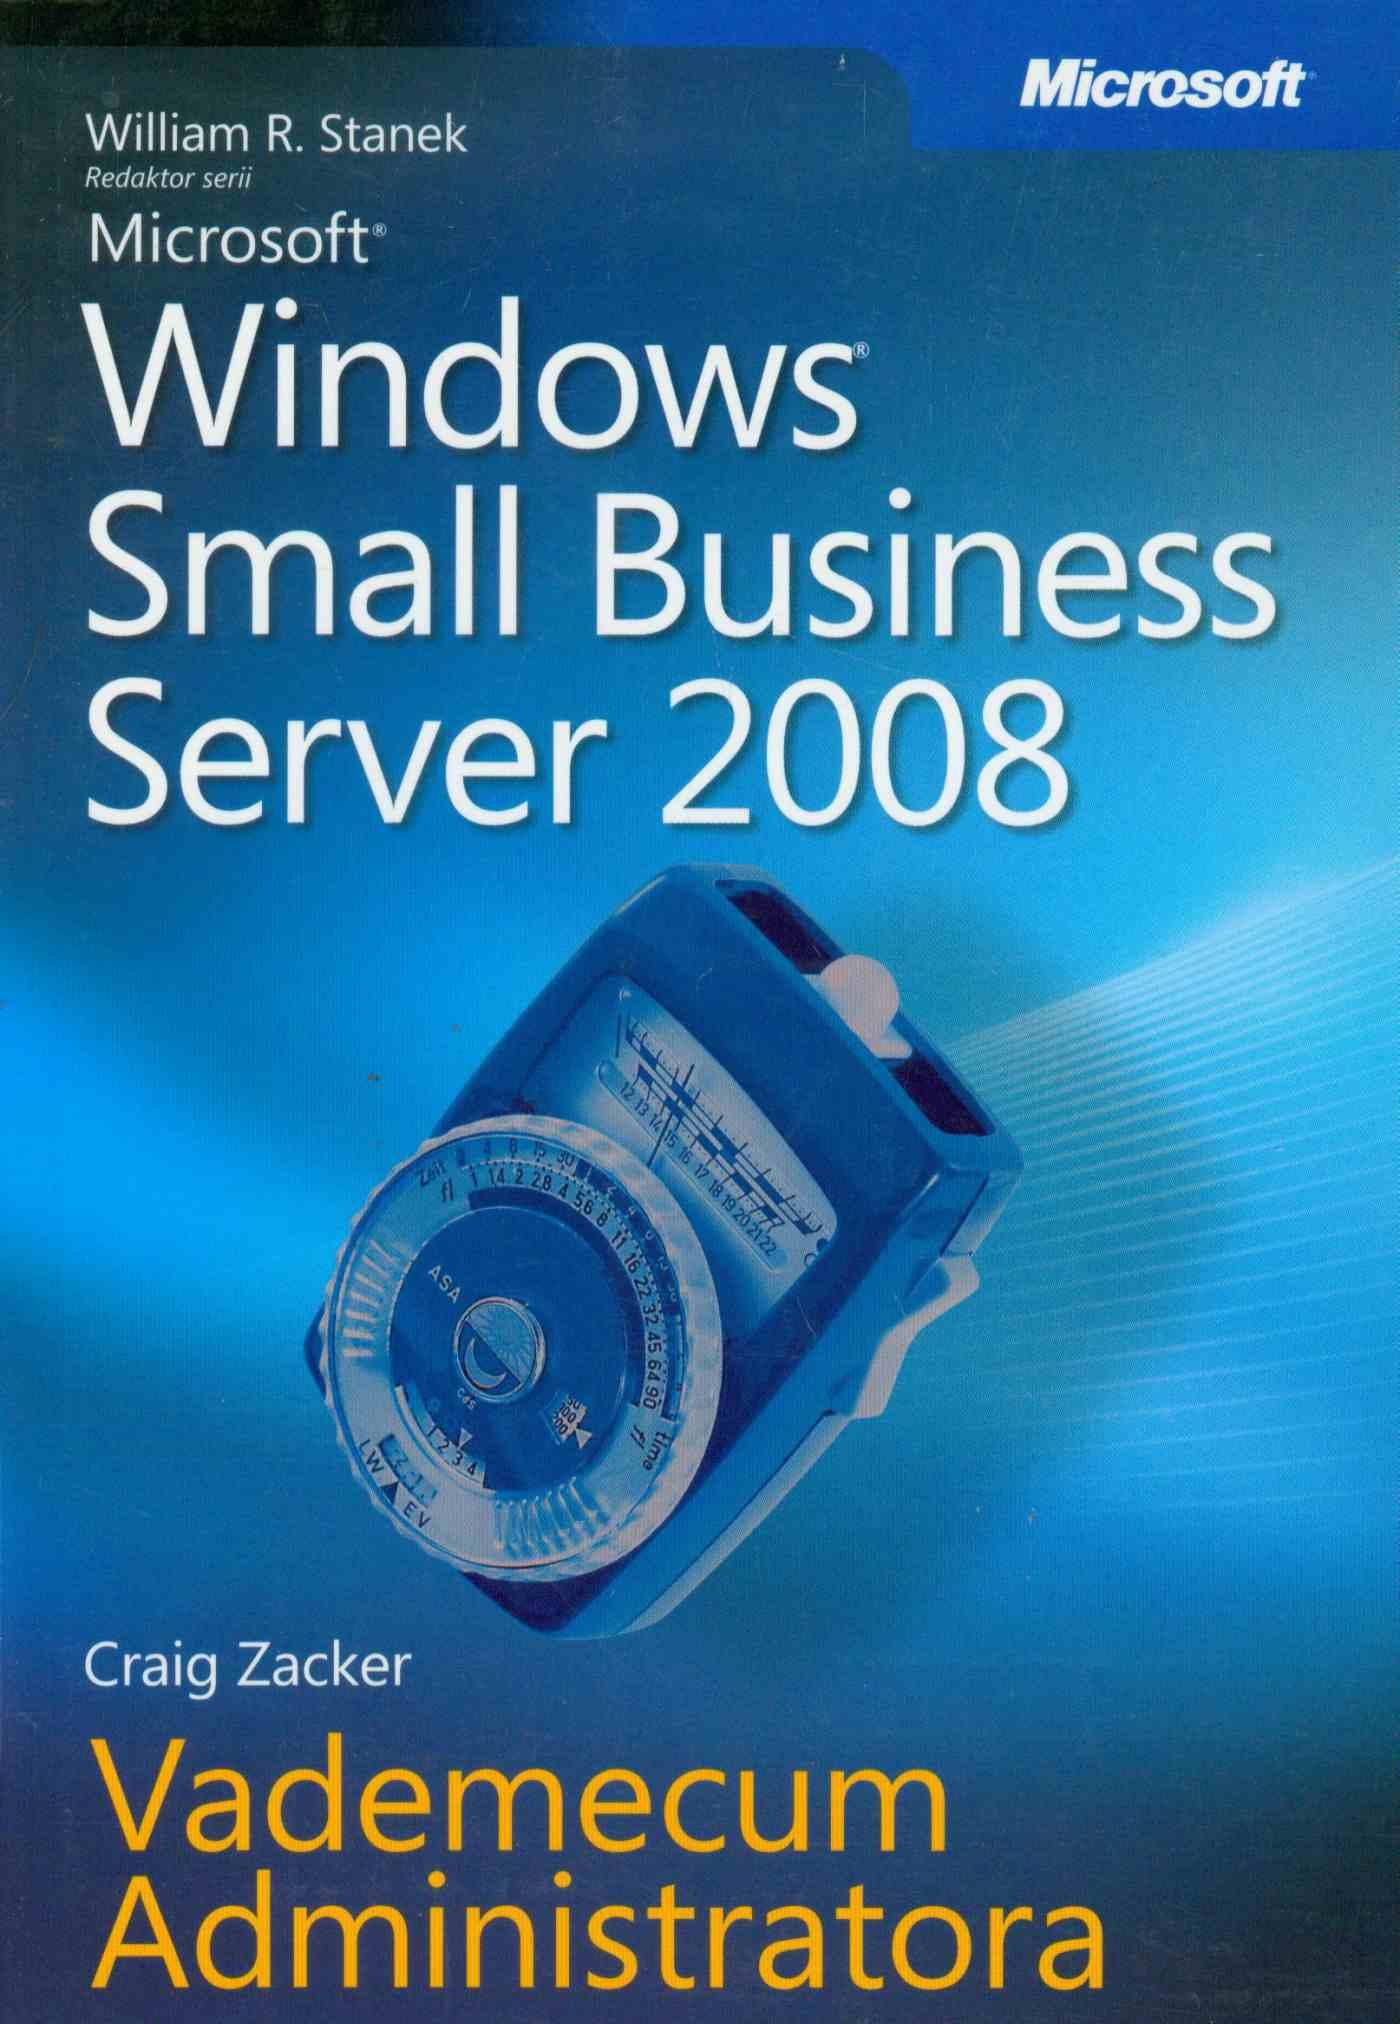 Microsoft Windows Small Business Server 2008 Vademecum Administratora - Ebook (Książka PDF) do pobrania w formacie PDF